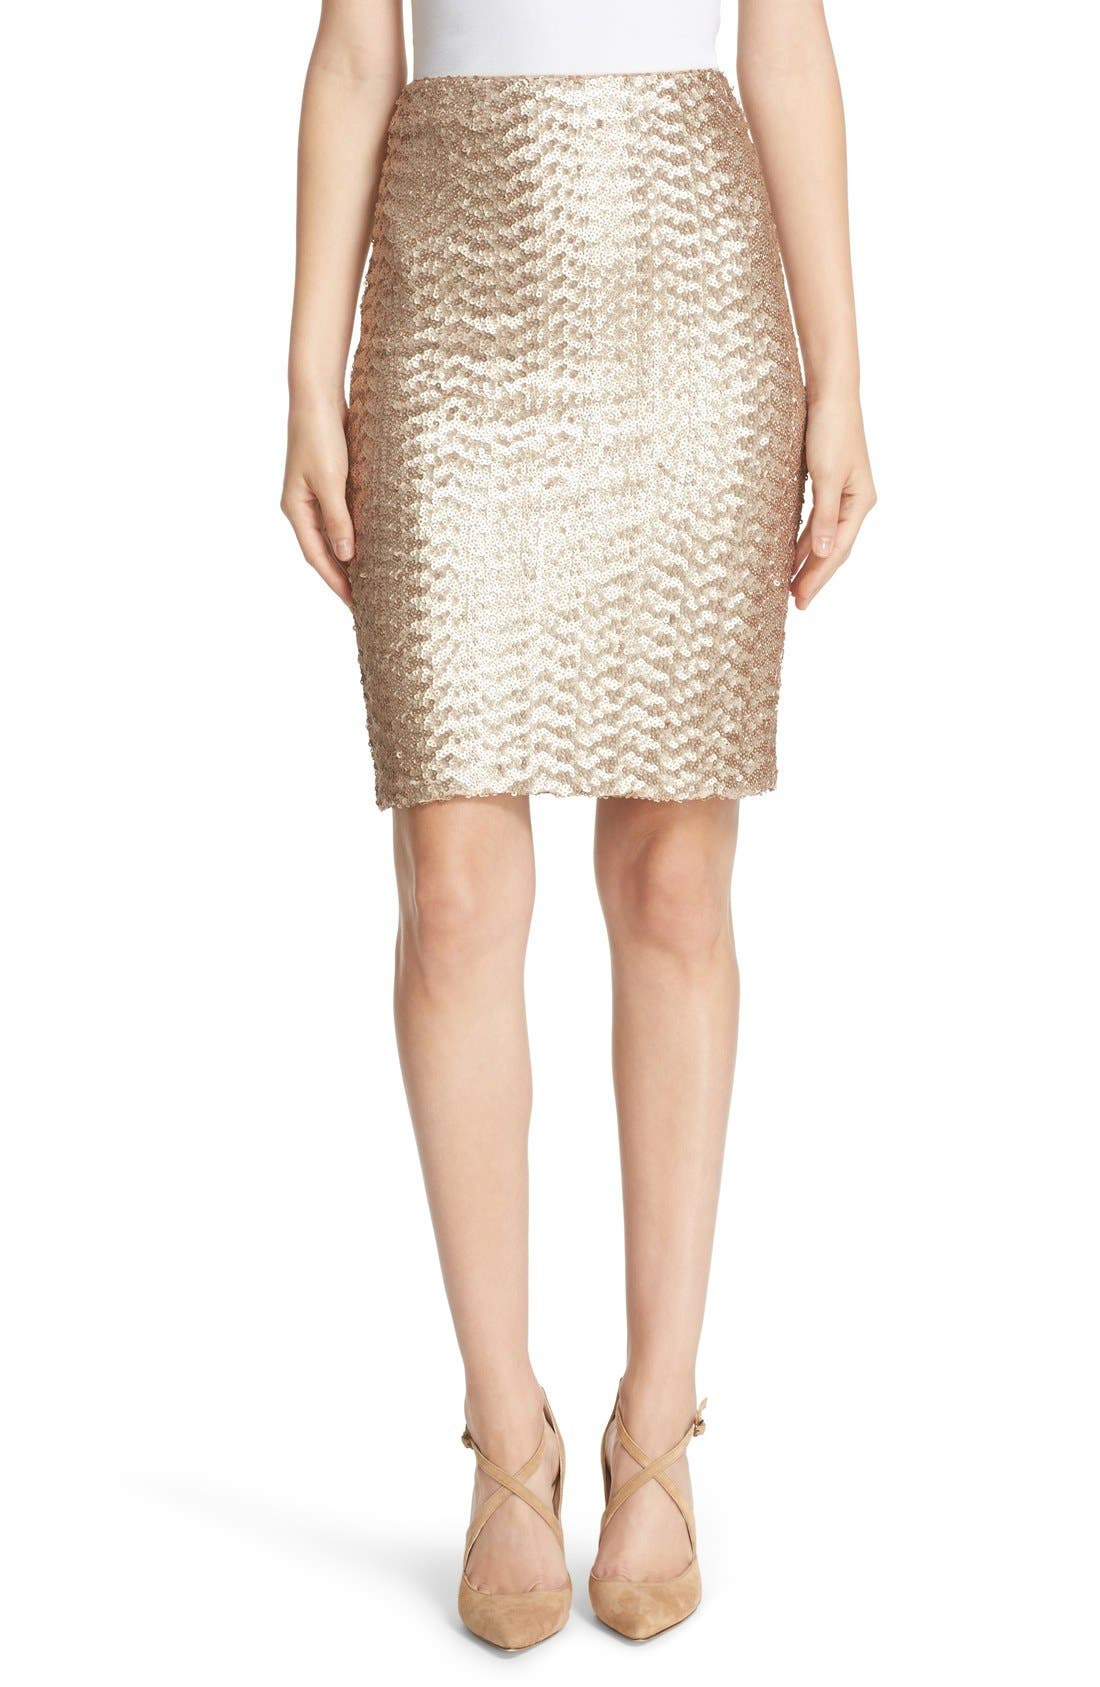 Alternate Image 1 Selected - Alice + Olivia 'Ramos' Sequin Pencil Skirt